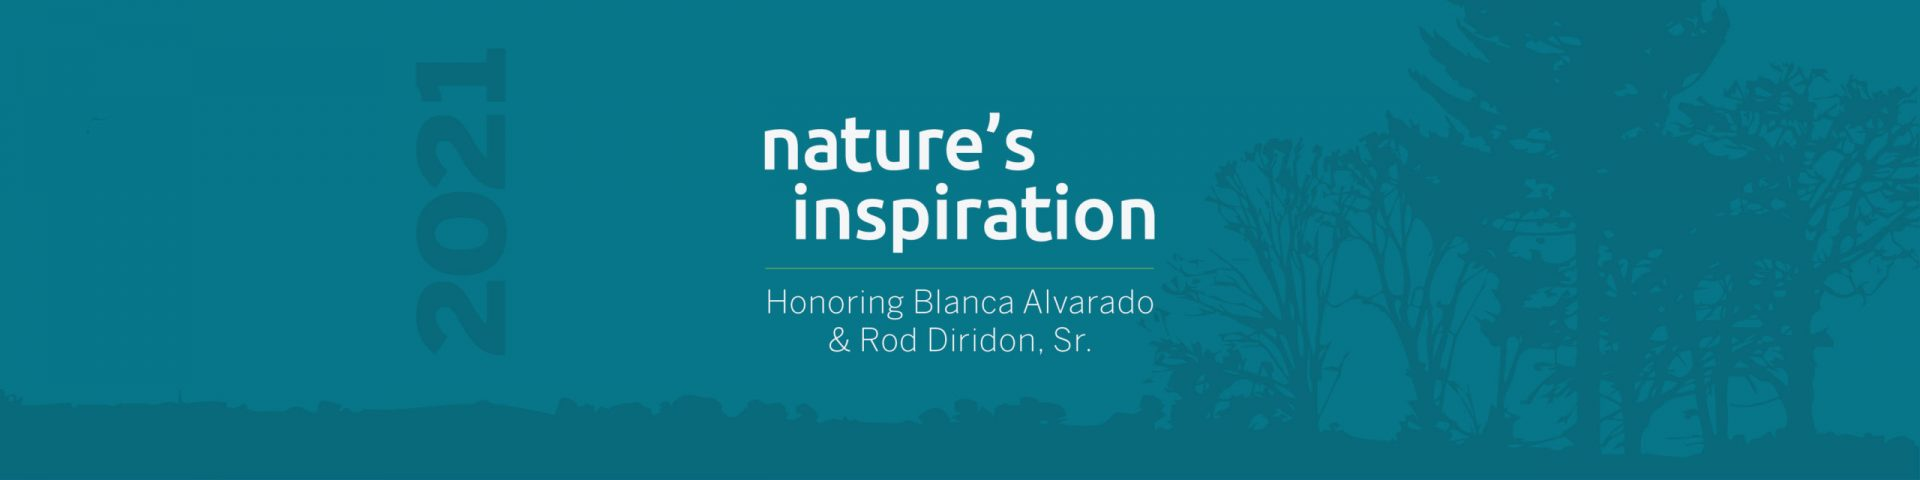 2021 Nature's Inspiration banner